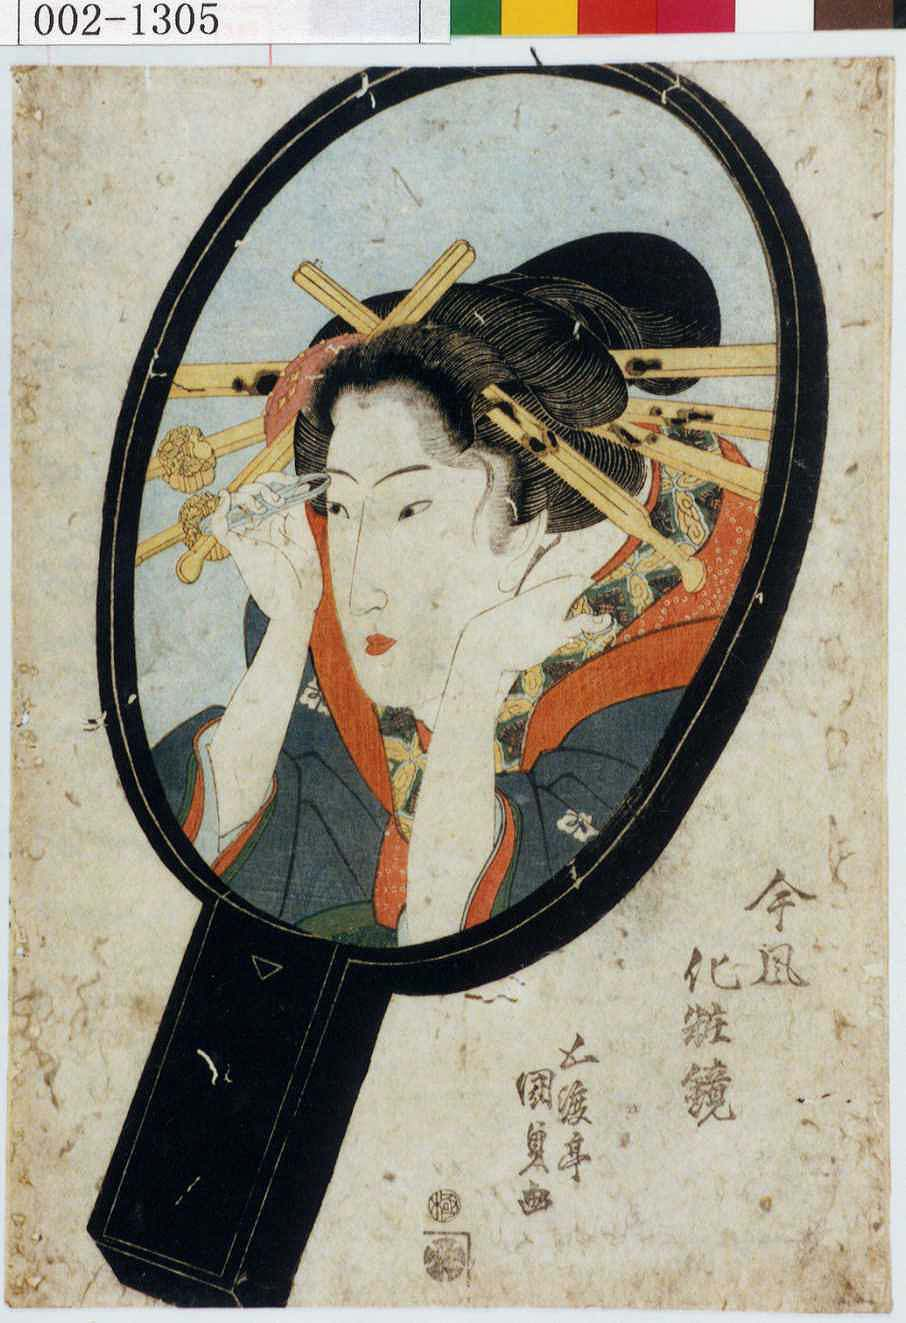 歌川国貞の画像 p1_30